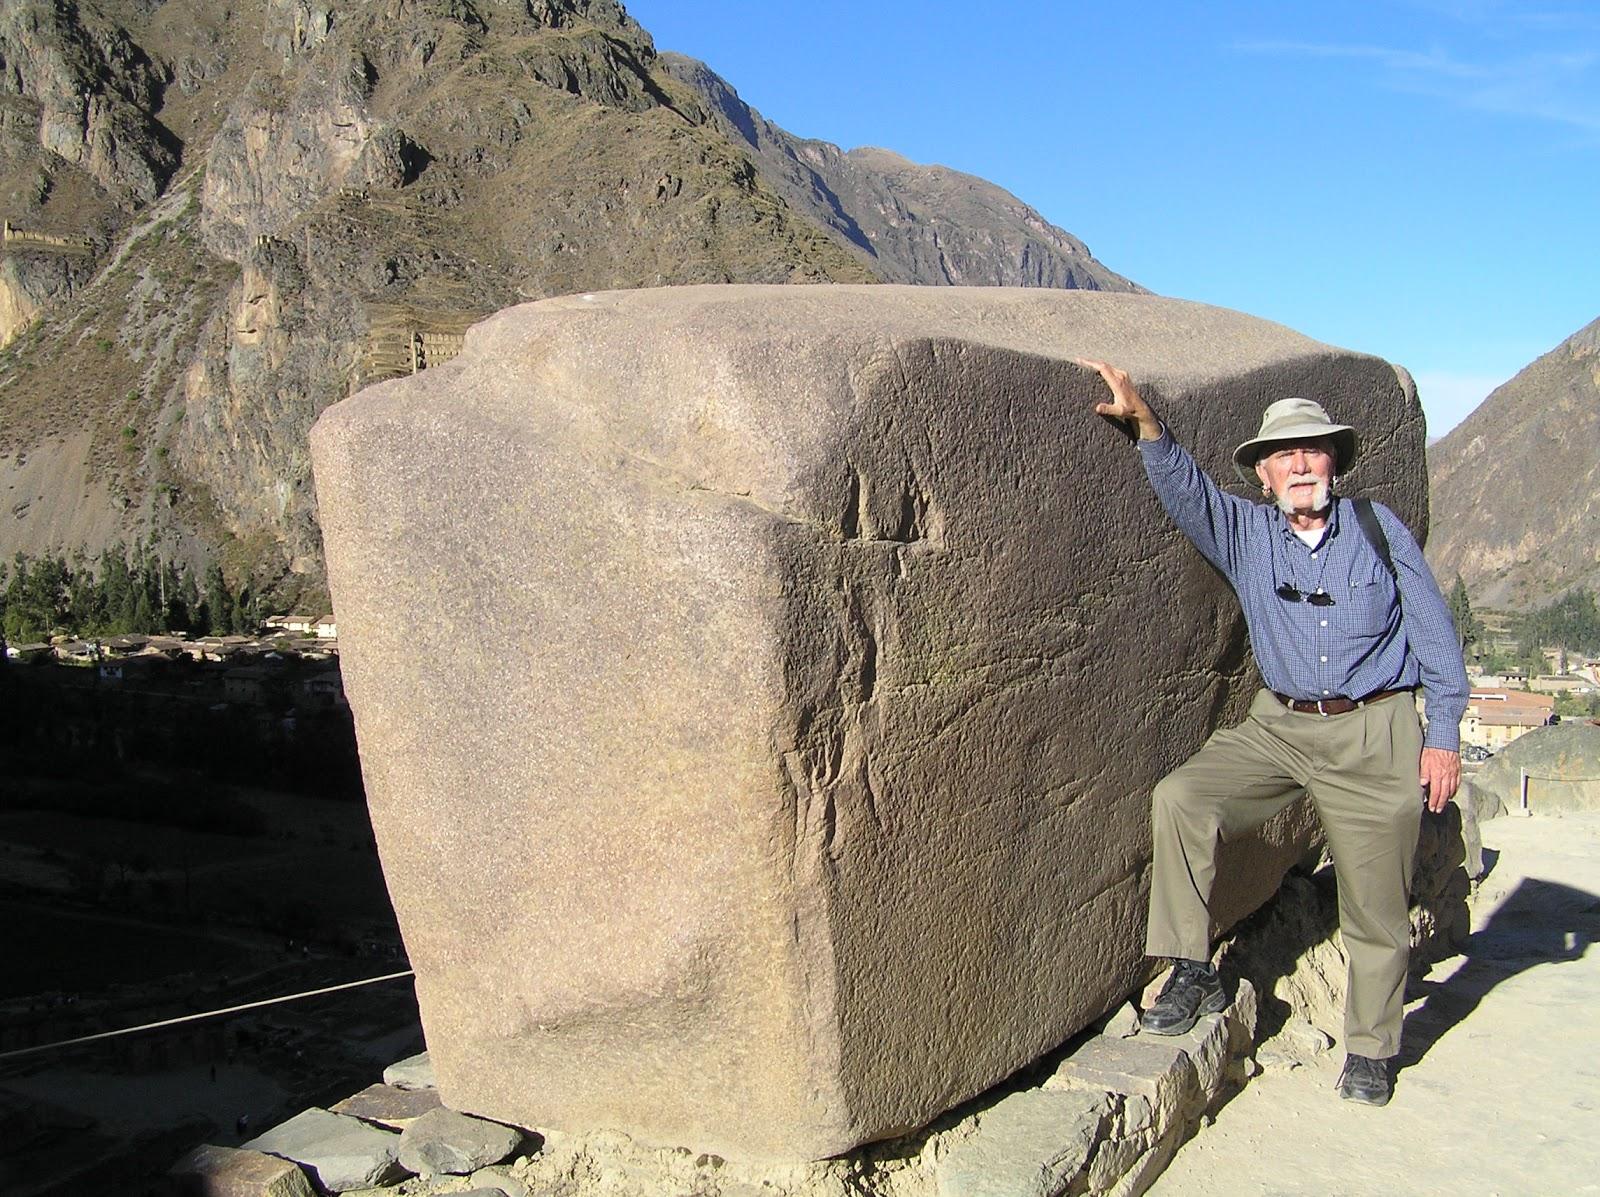 Impresionantes bloques de piedra. Un investigador posa junto a ella.